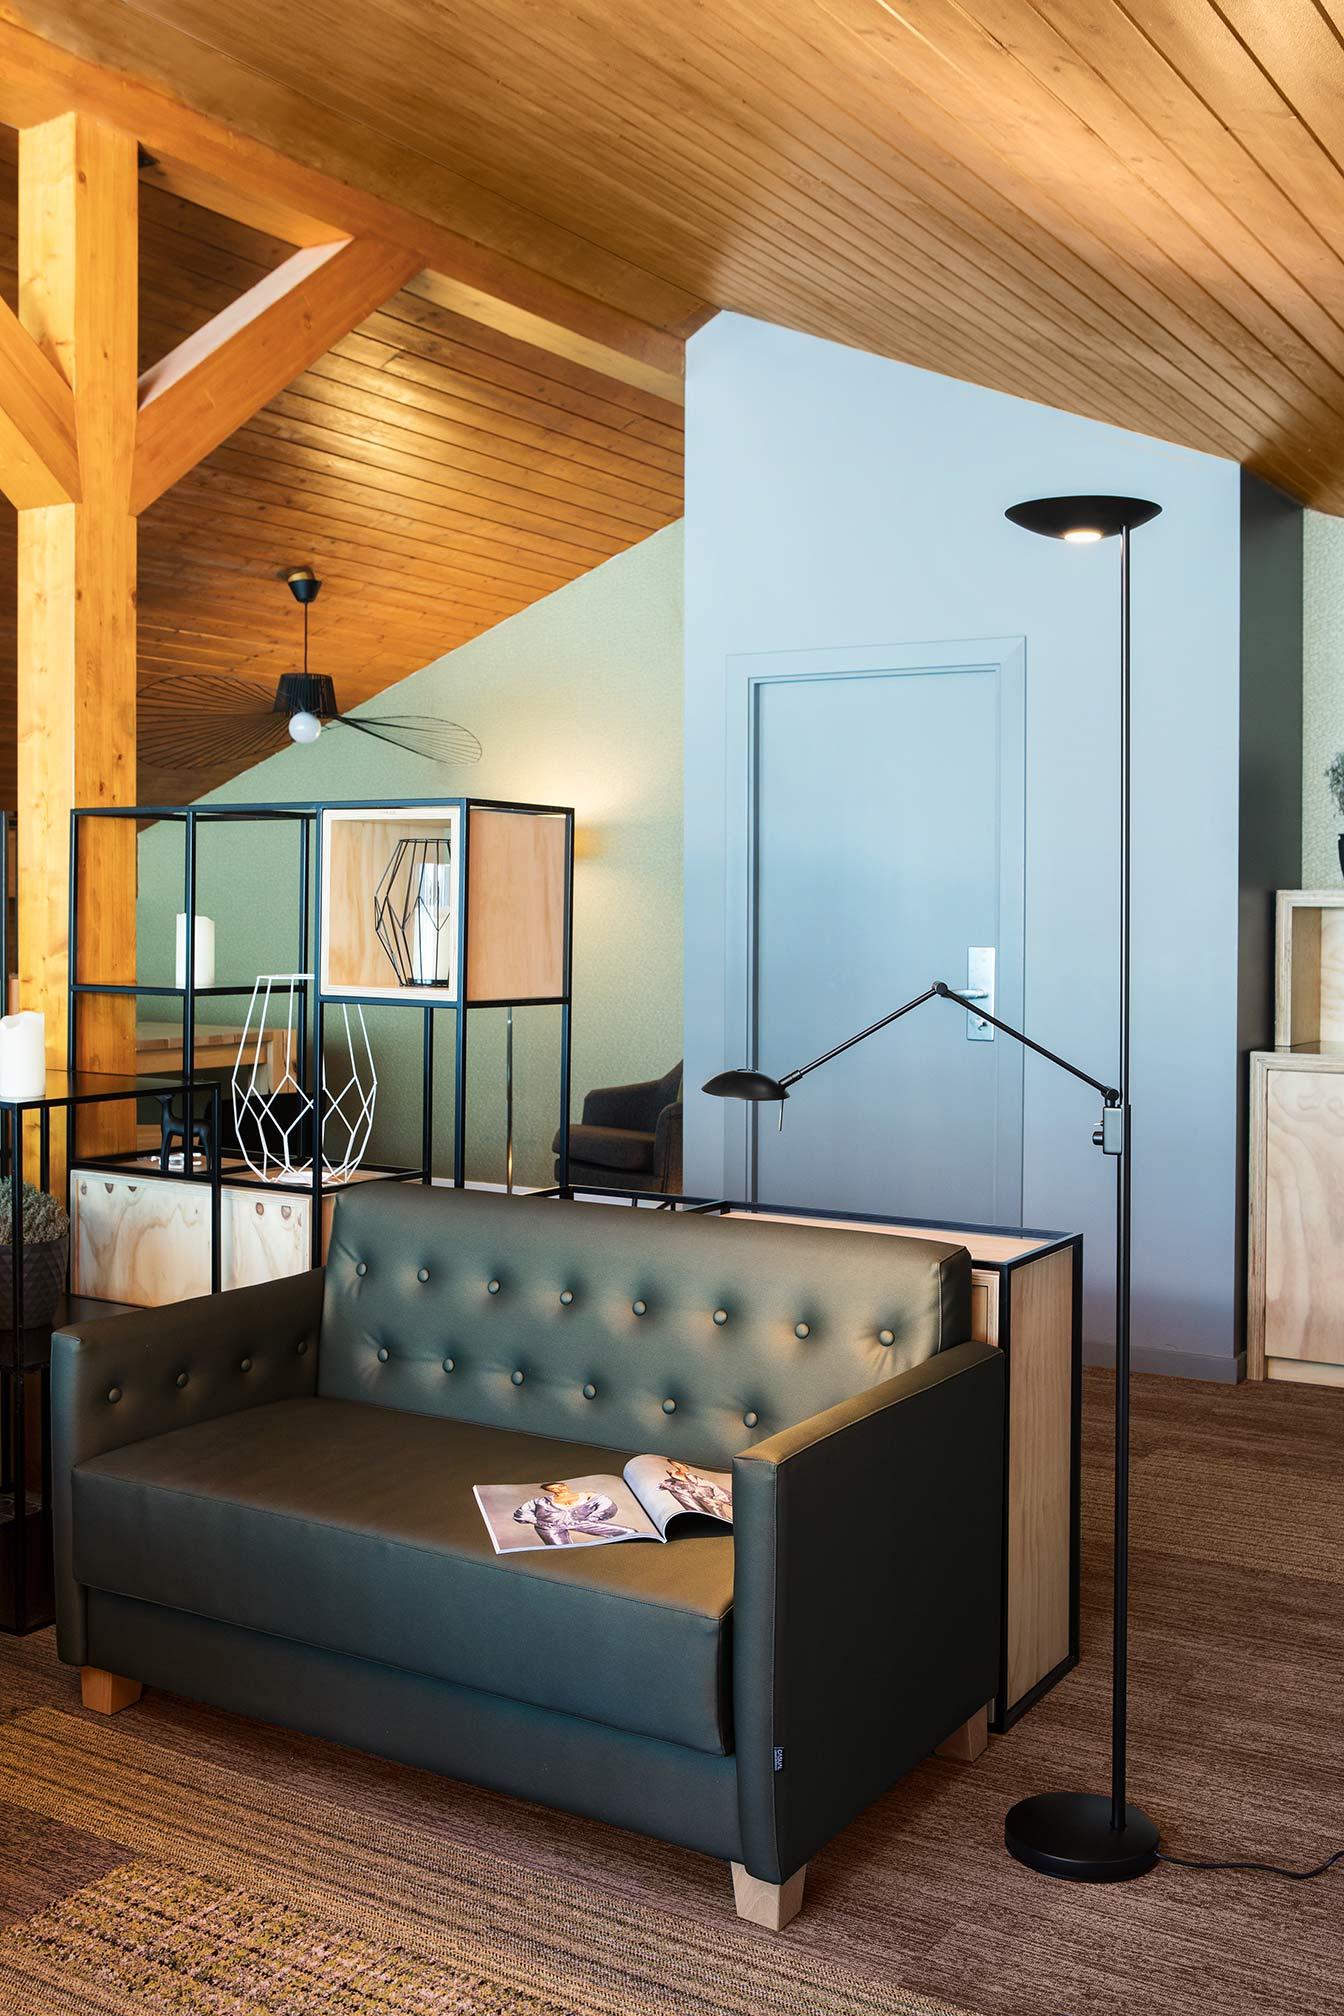 Sala Lounge Mountain Hostel en el Tarter, Grandvalira Andorra - Rosa Colet